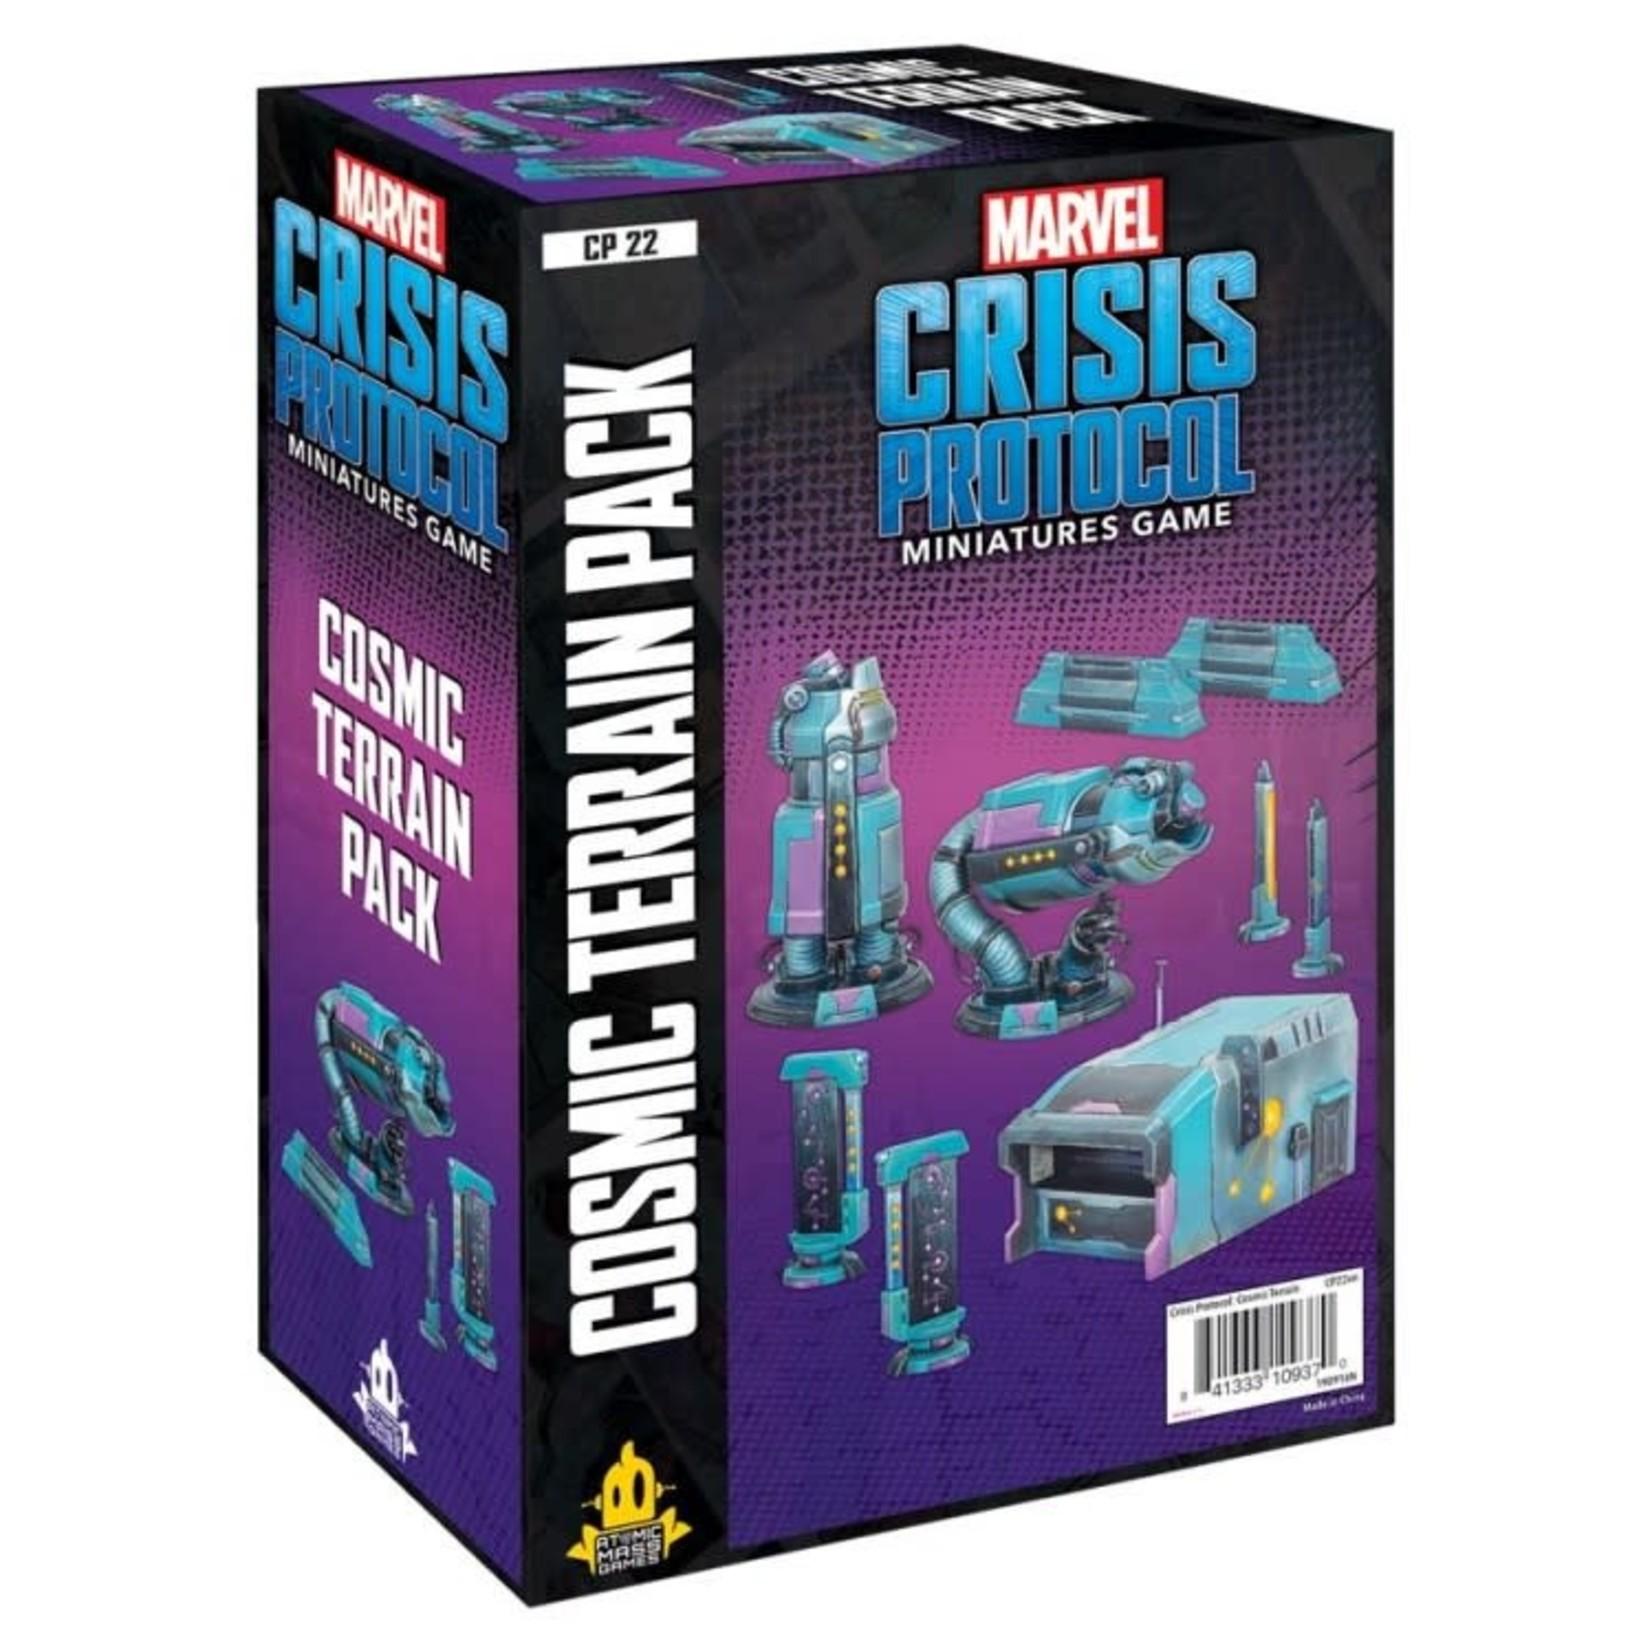 Atomic Mass Games Marvel Crisis Protocol: Cosmic Terrain Expansion